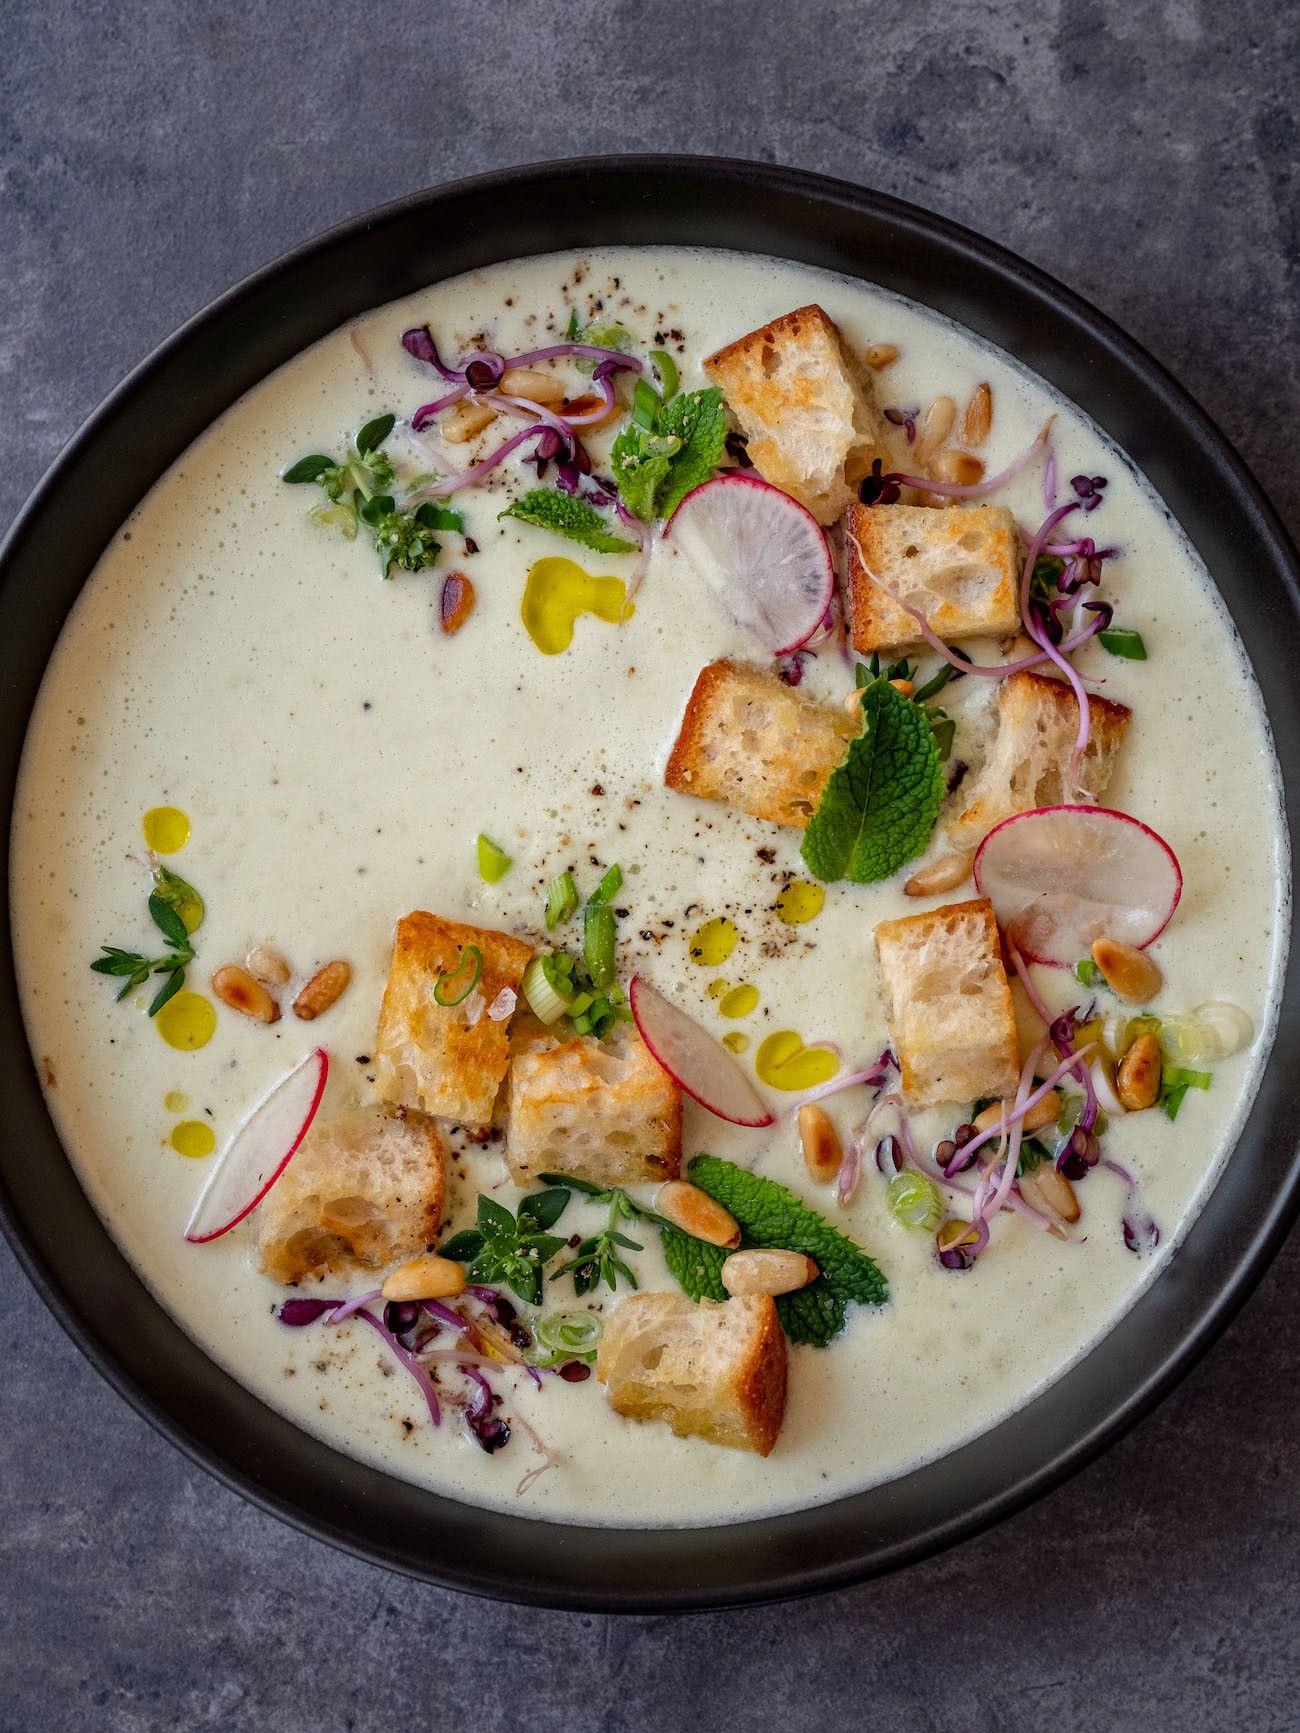 Foodblog, About Fuel, Rezept Gurken-Mandel-Gazpacho mit Croutons, Suppe